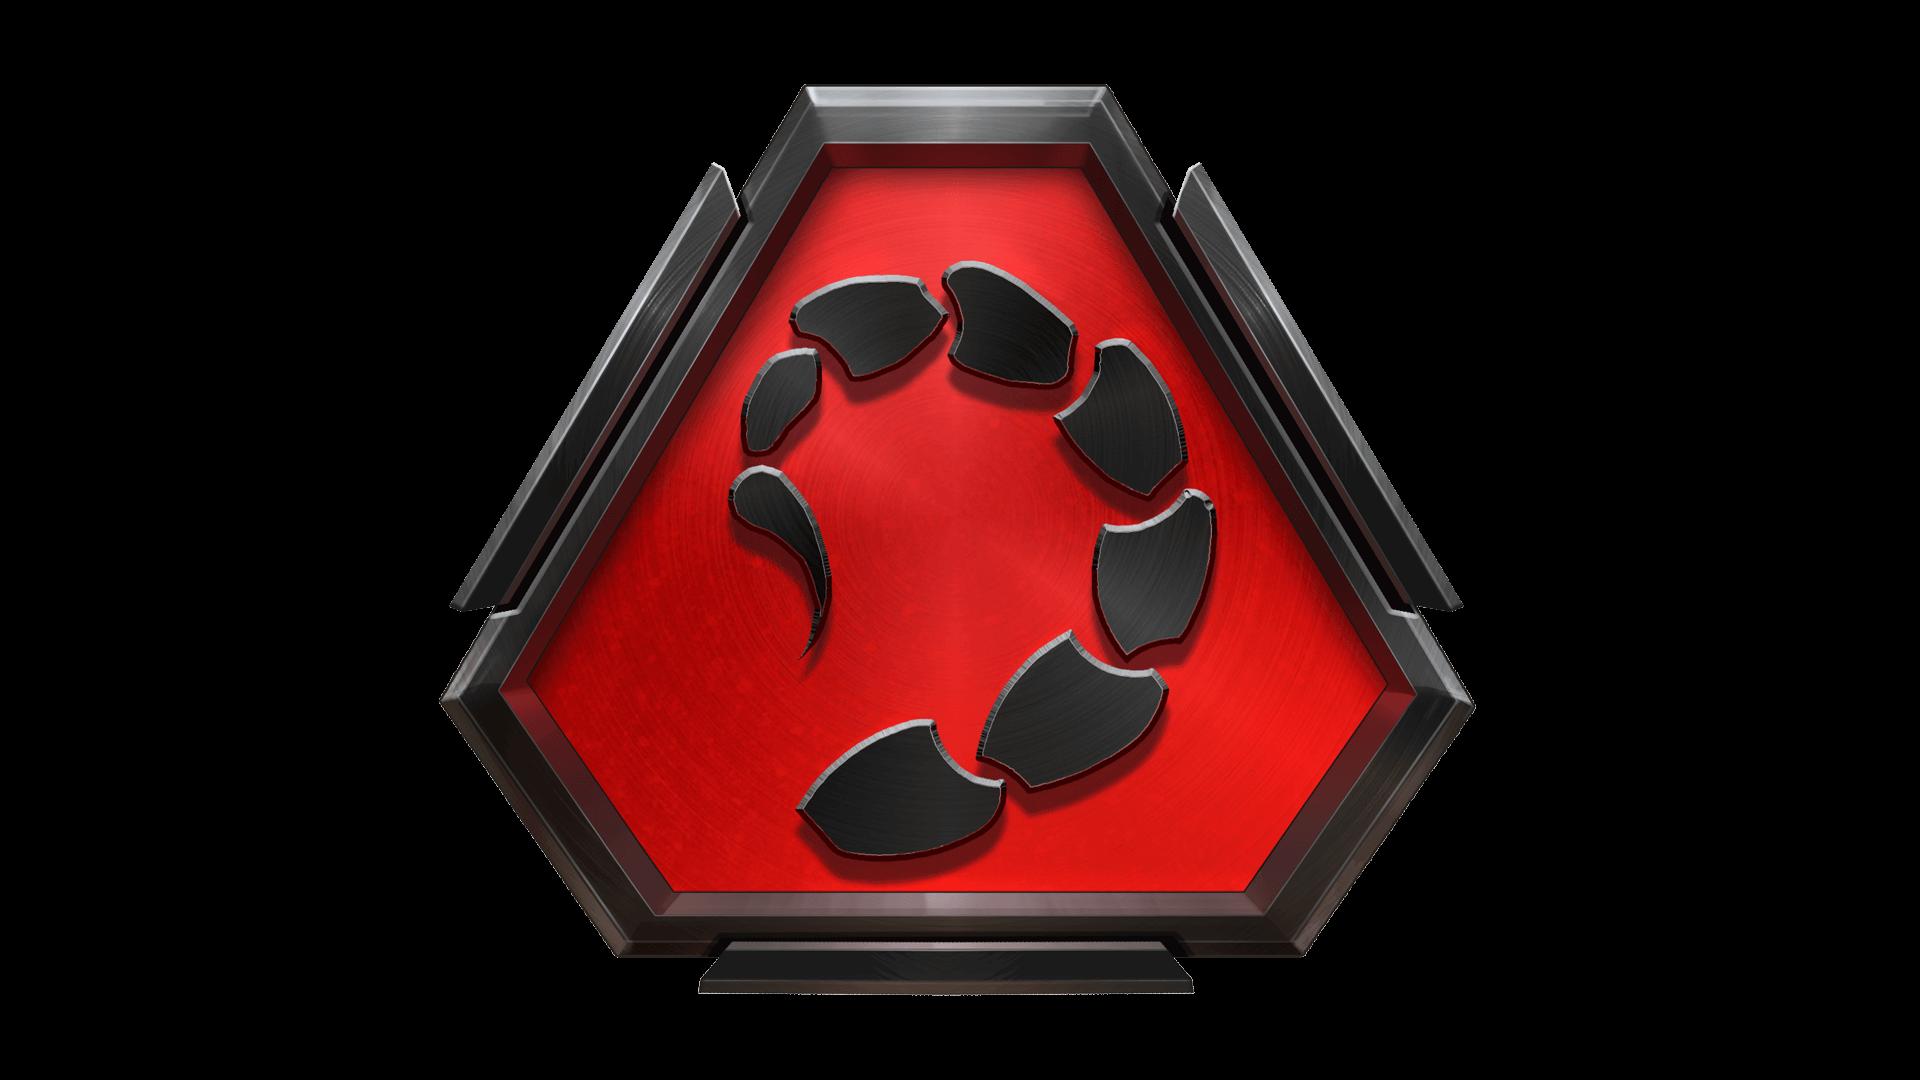 ea featured graphics cp 40232 nod logo BattleZone